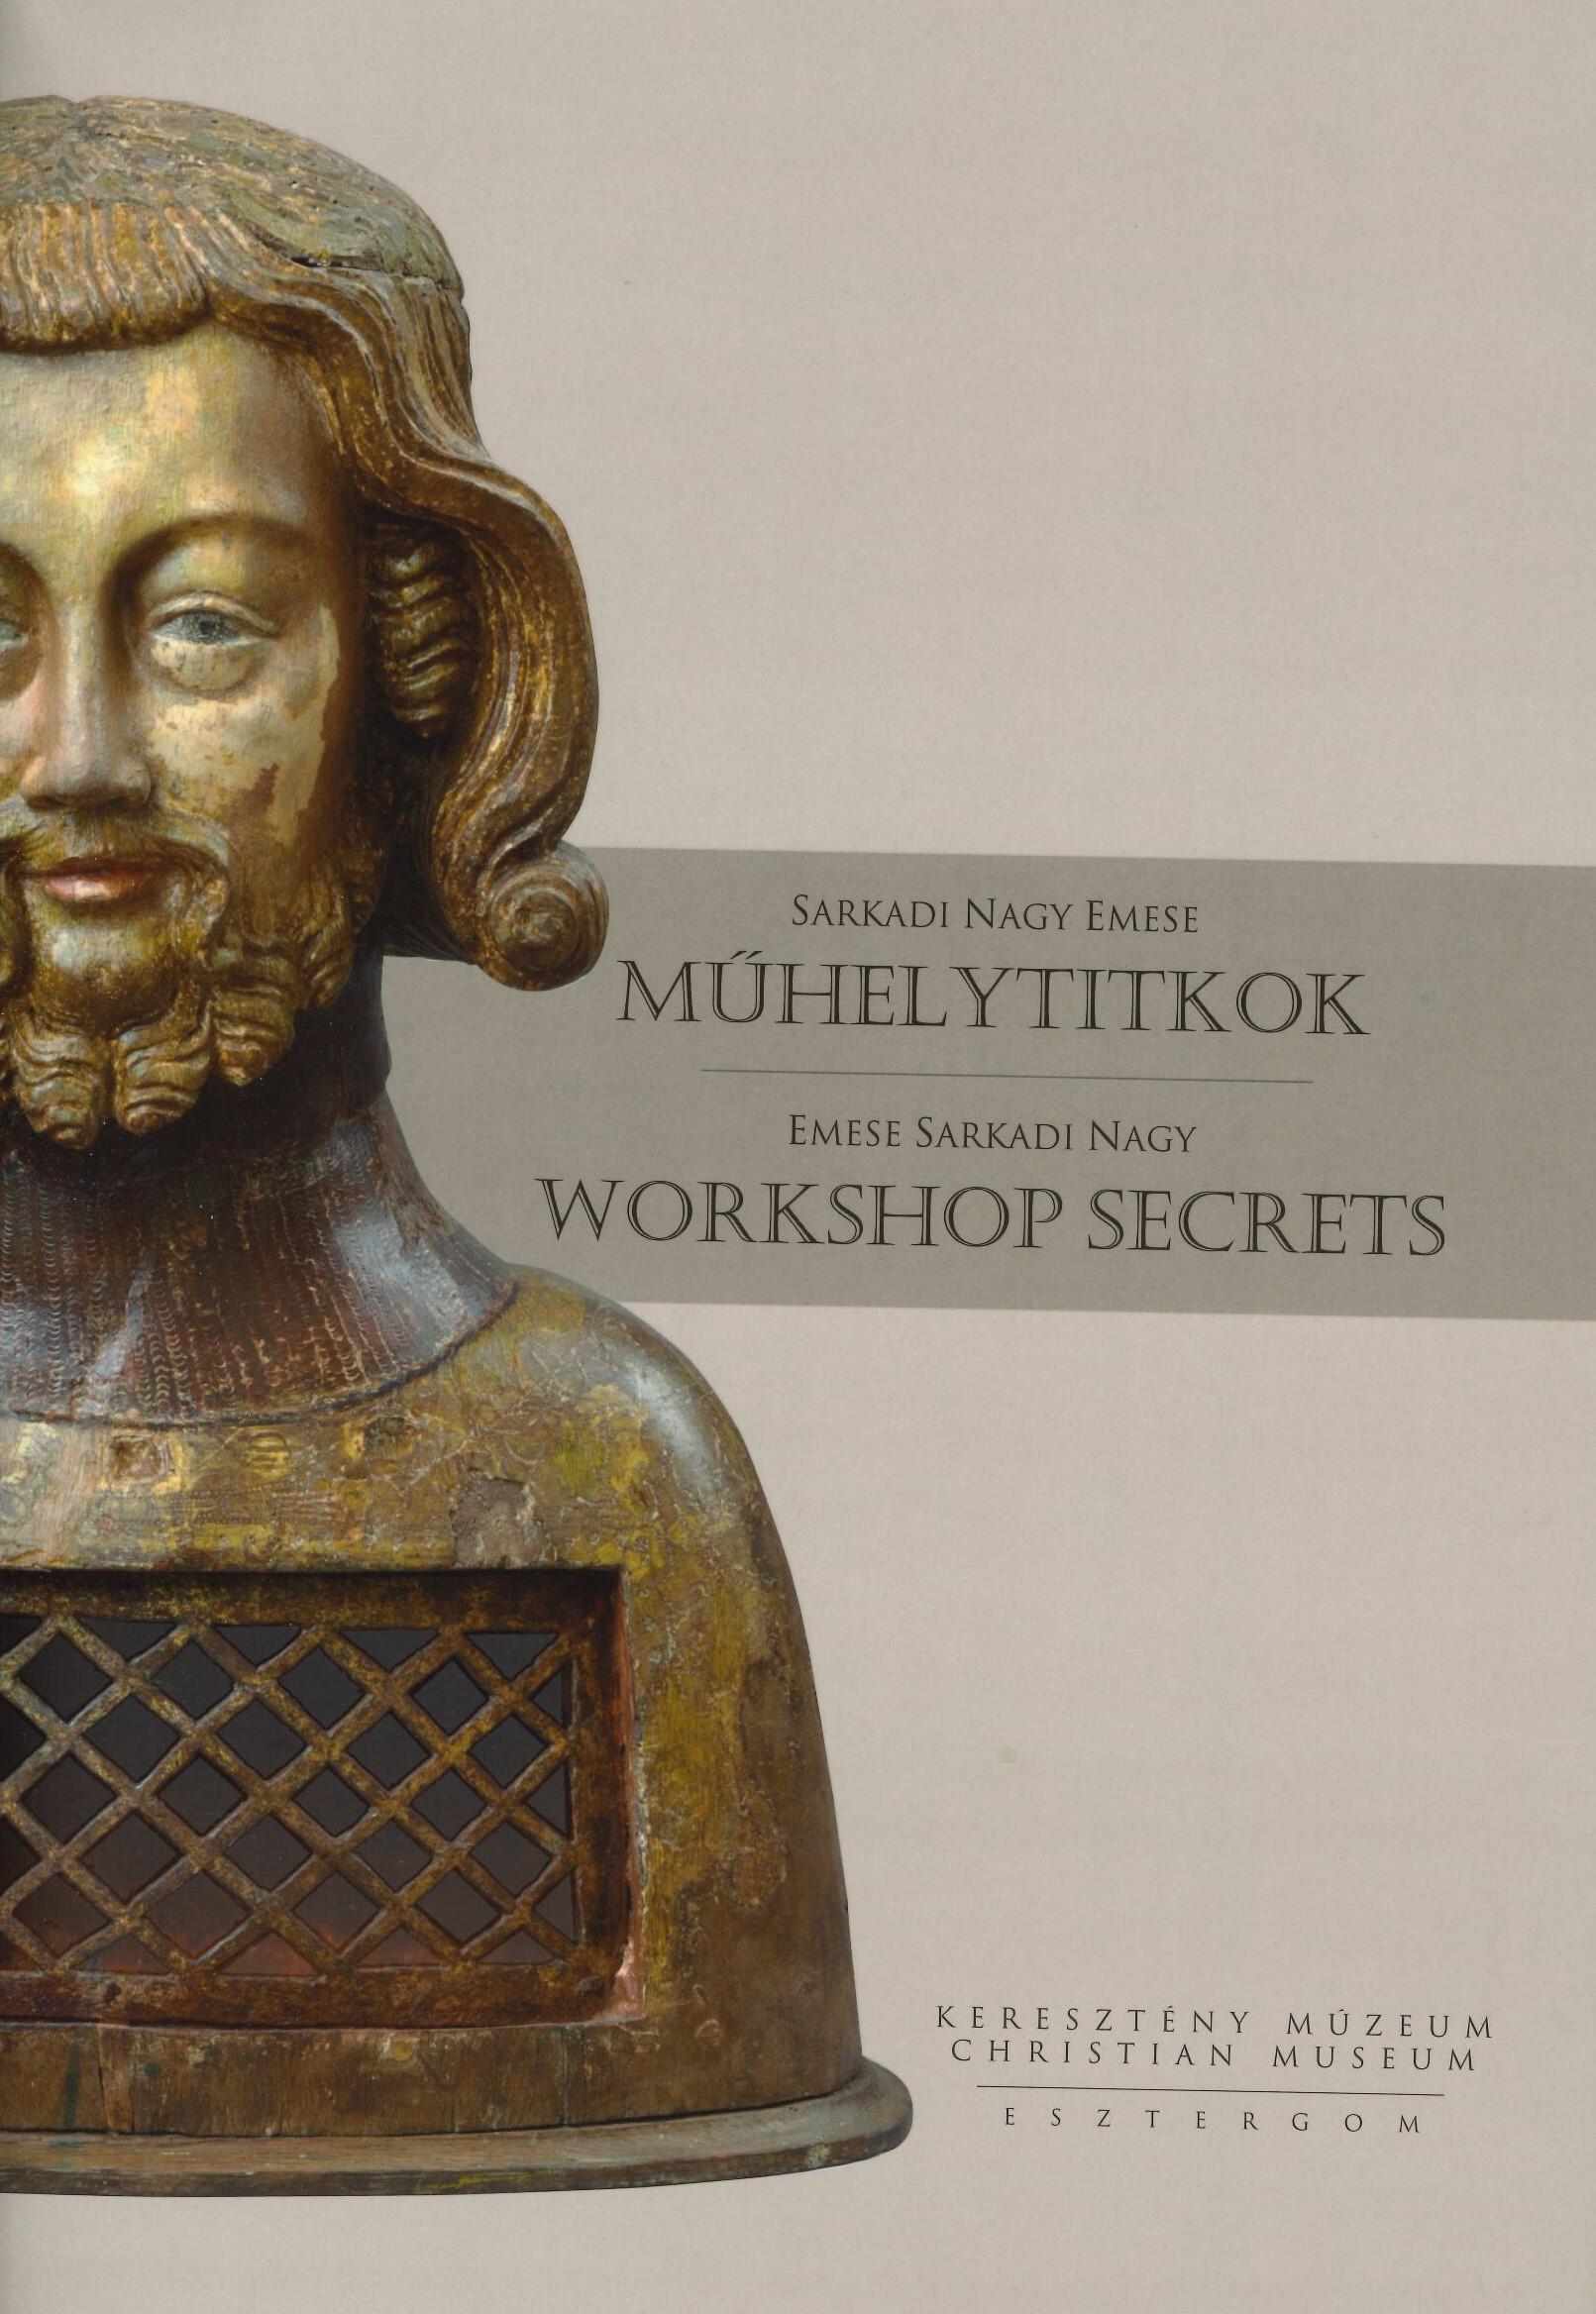 workshop_secrets.jpg